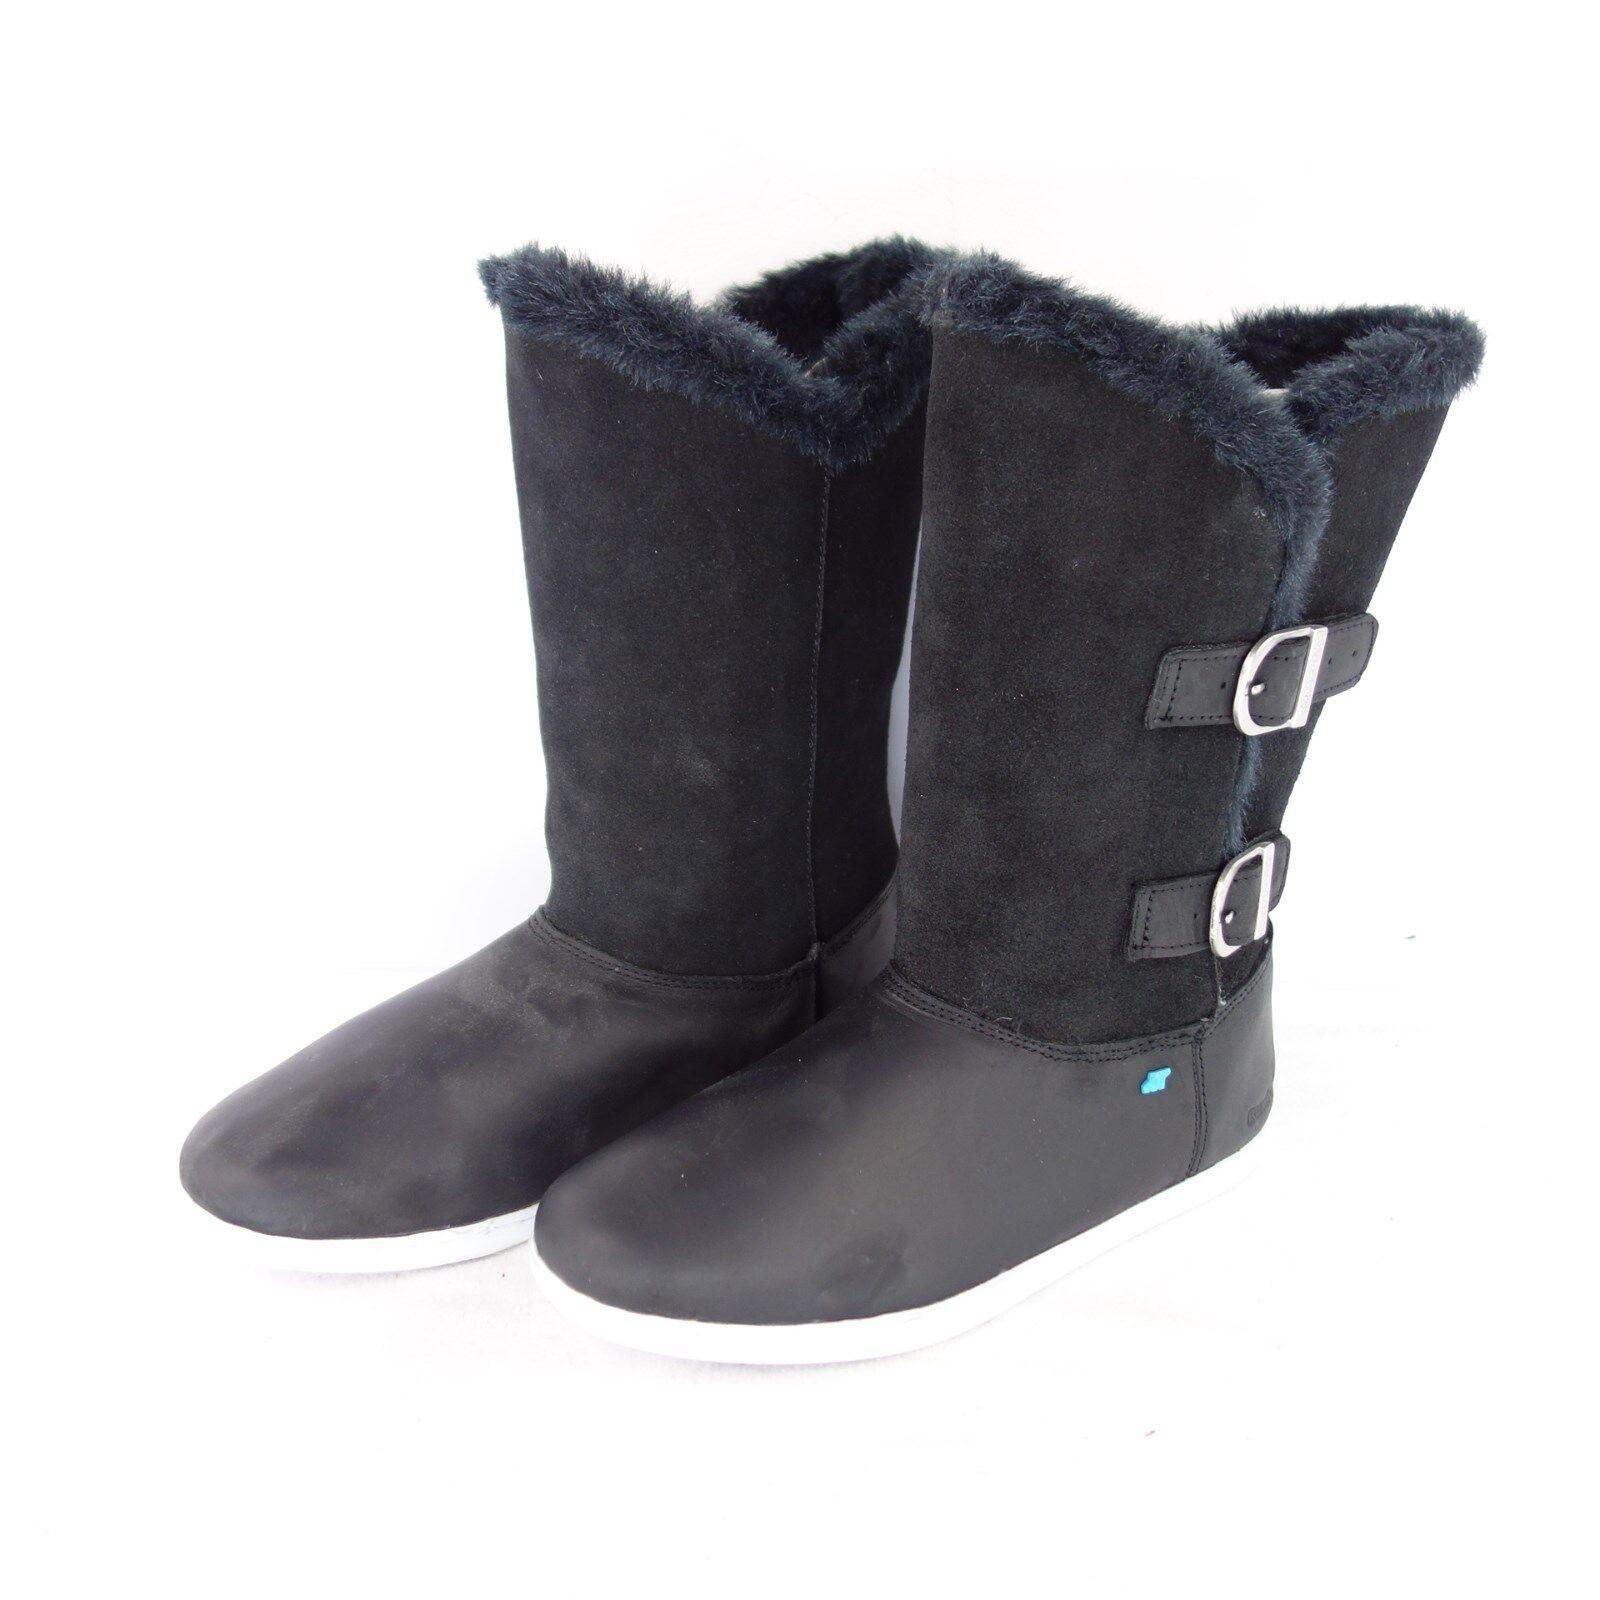 BOXFRESH Stiefel Schuhe KATE 36 37 39 Stiefel Leder Gefüttert Fell Warm NP 129 NEU